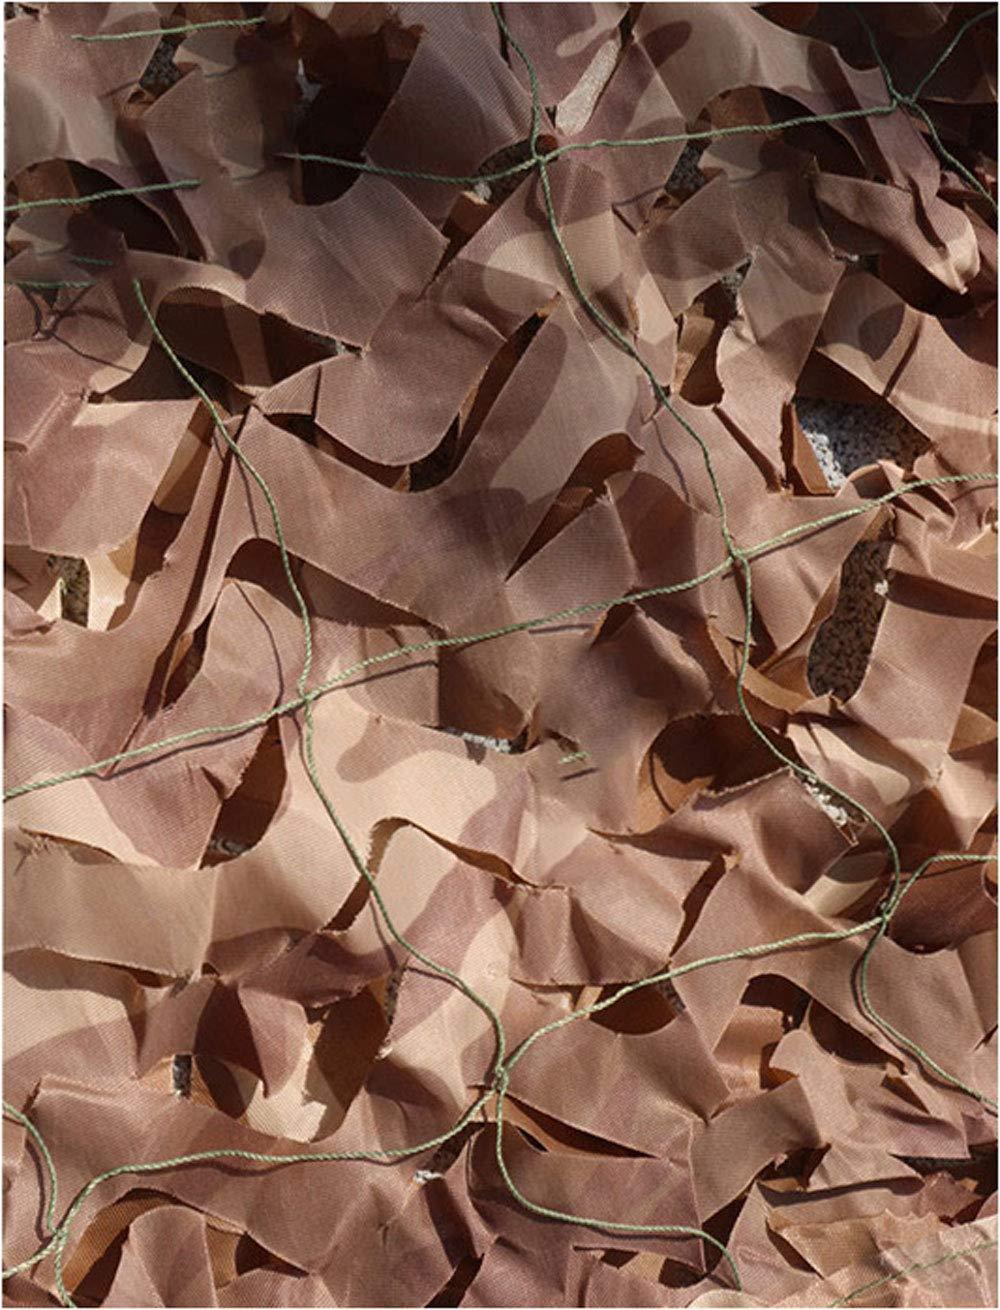 2M×3M迷彩ネット砂漠迷彩ネットキャンプ軍事狩猟射撃オックスフォード布、屋外の太陽、テーマパーティーの装飾、車のカバー迷彩 (サイズ さいず : 10m×10m) 10m×10m  B07MHNPKLQ